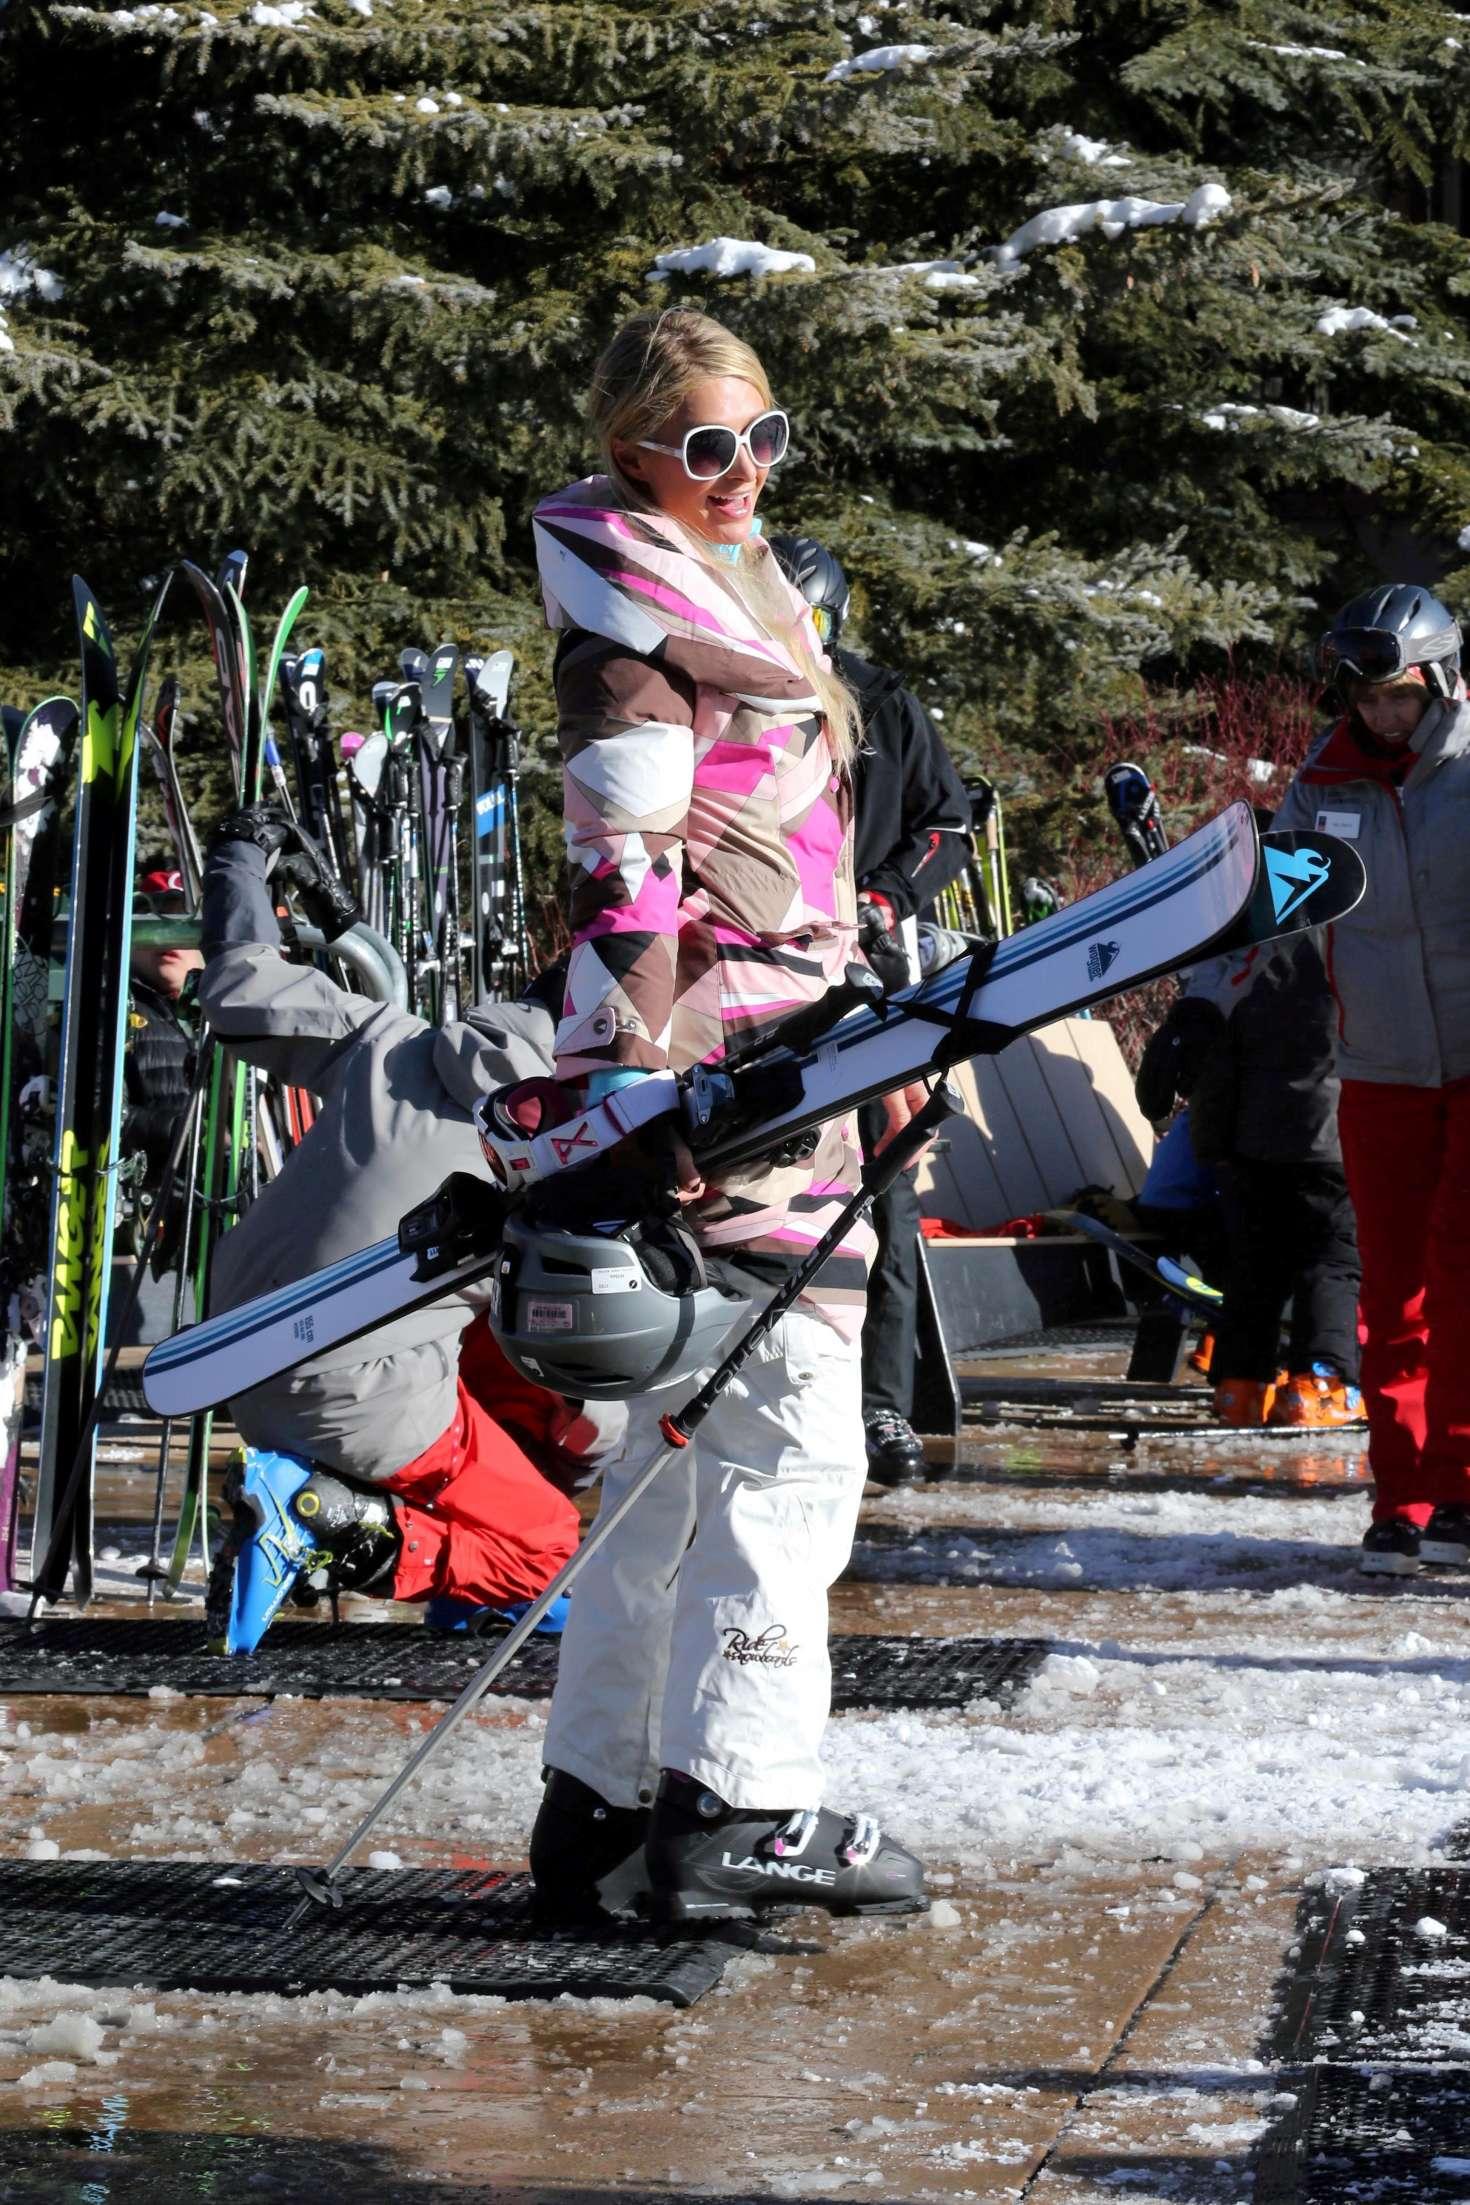 Paris Hilton 2016 : Paris Hilton Skiing in Aspen -36